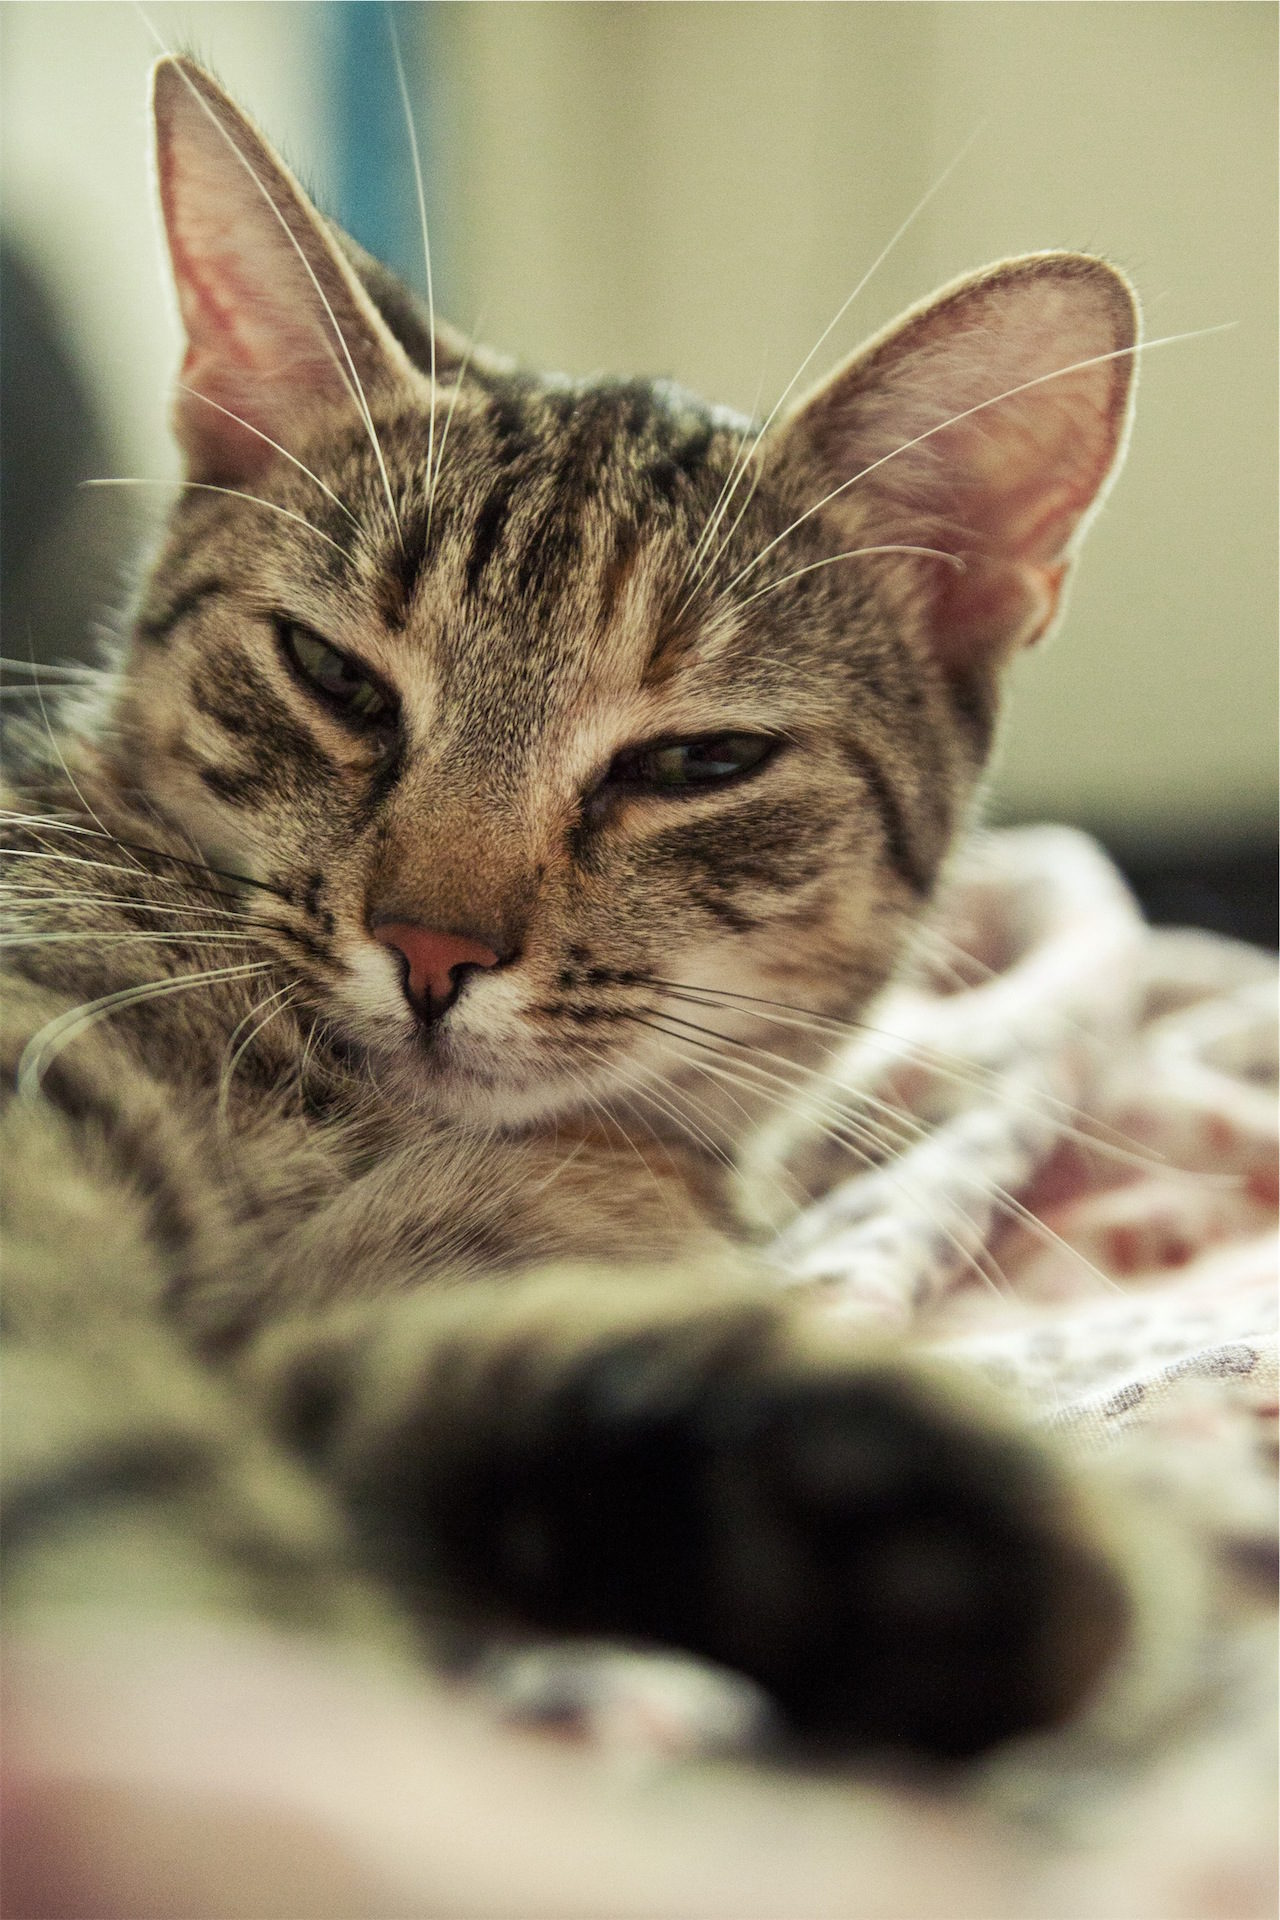 Katze, Haustier, Blick, schläfrig, kuschelige - Wallpaper HD - Prof.-falken.com